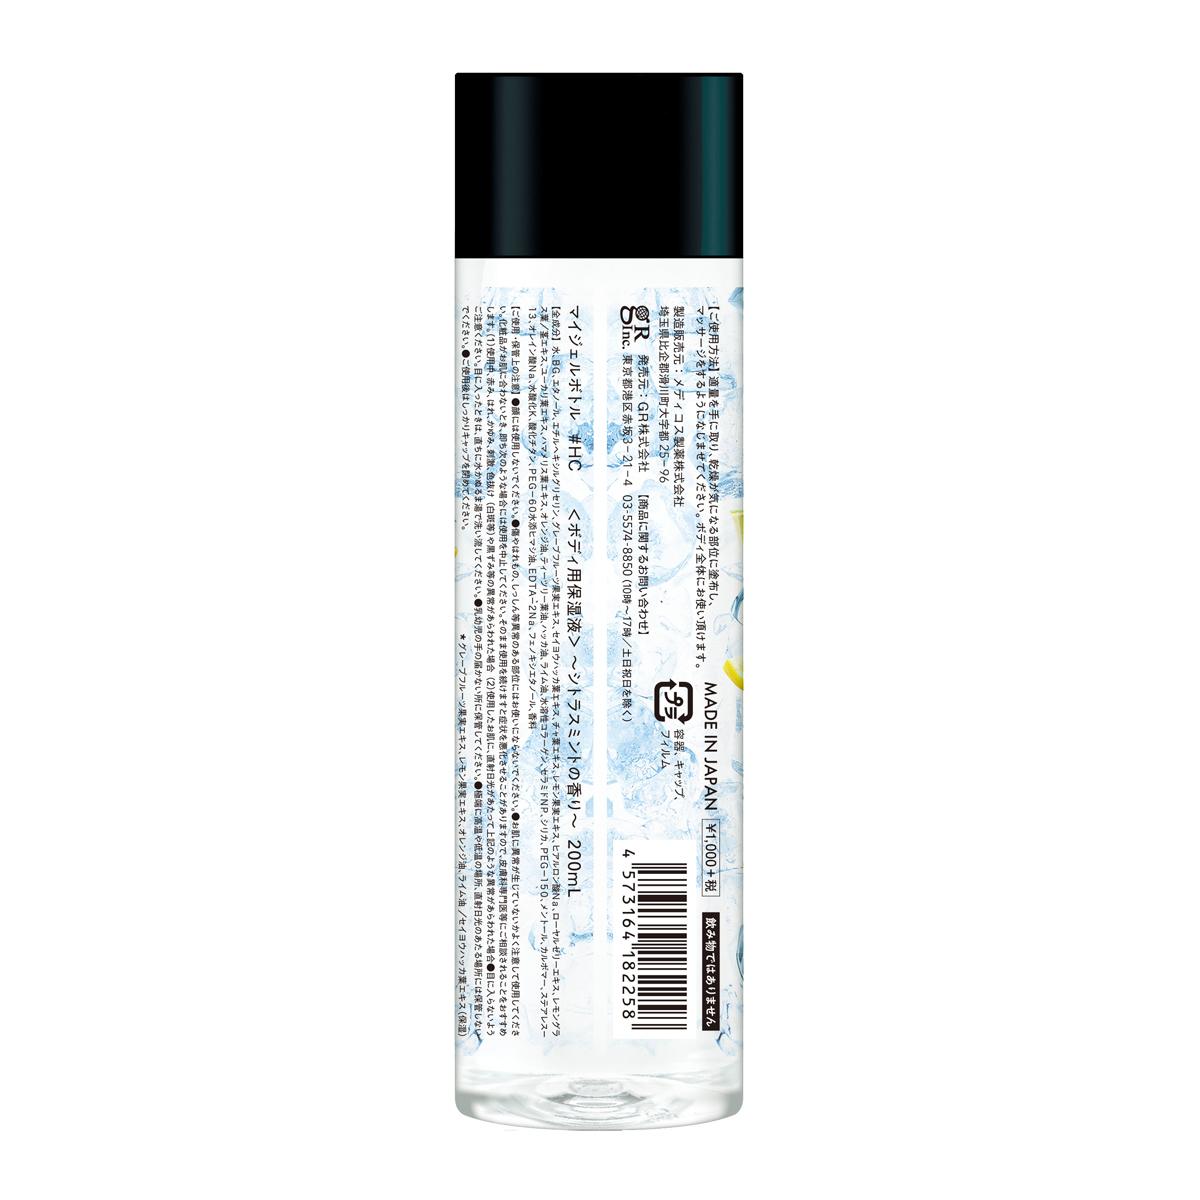 MY GEL BOTTLE[マイ・ジェル・ボトル]【香り:シトラスミント】200ml